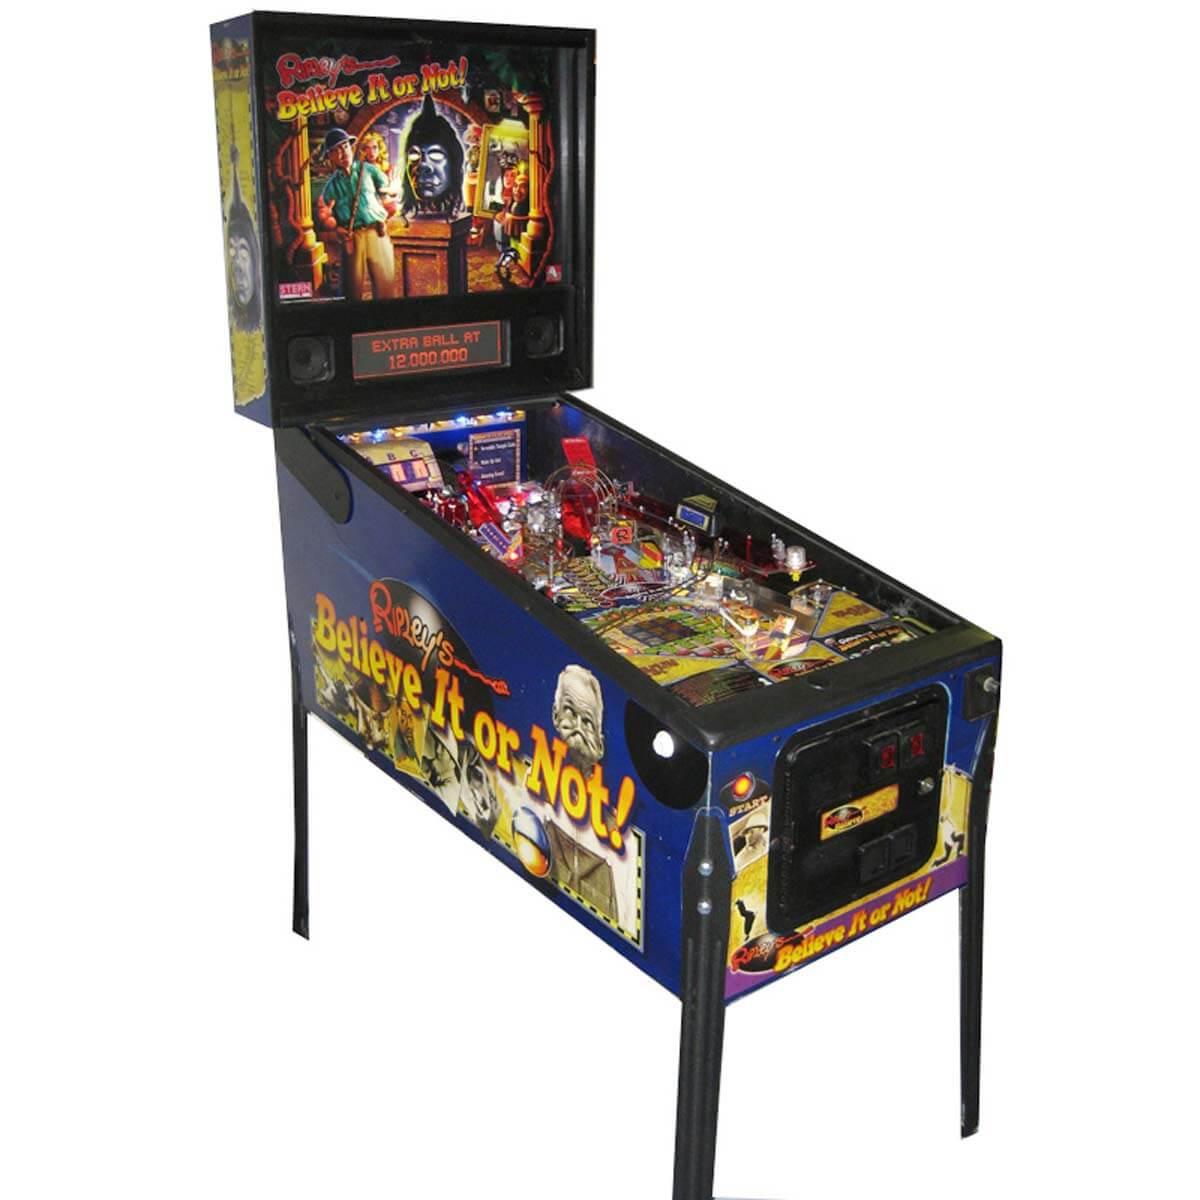 Ripley's Believe it or Not! Pinball Machine